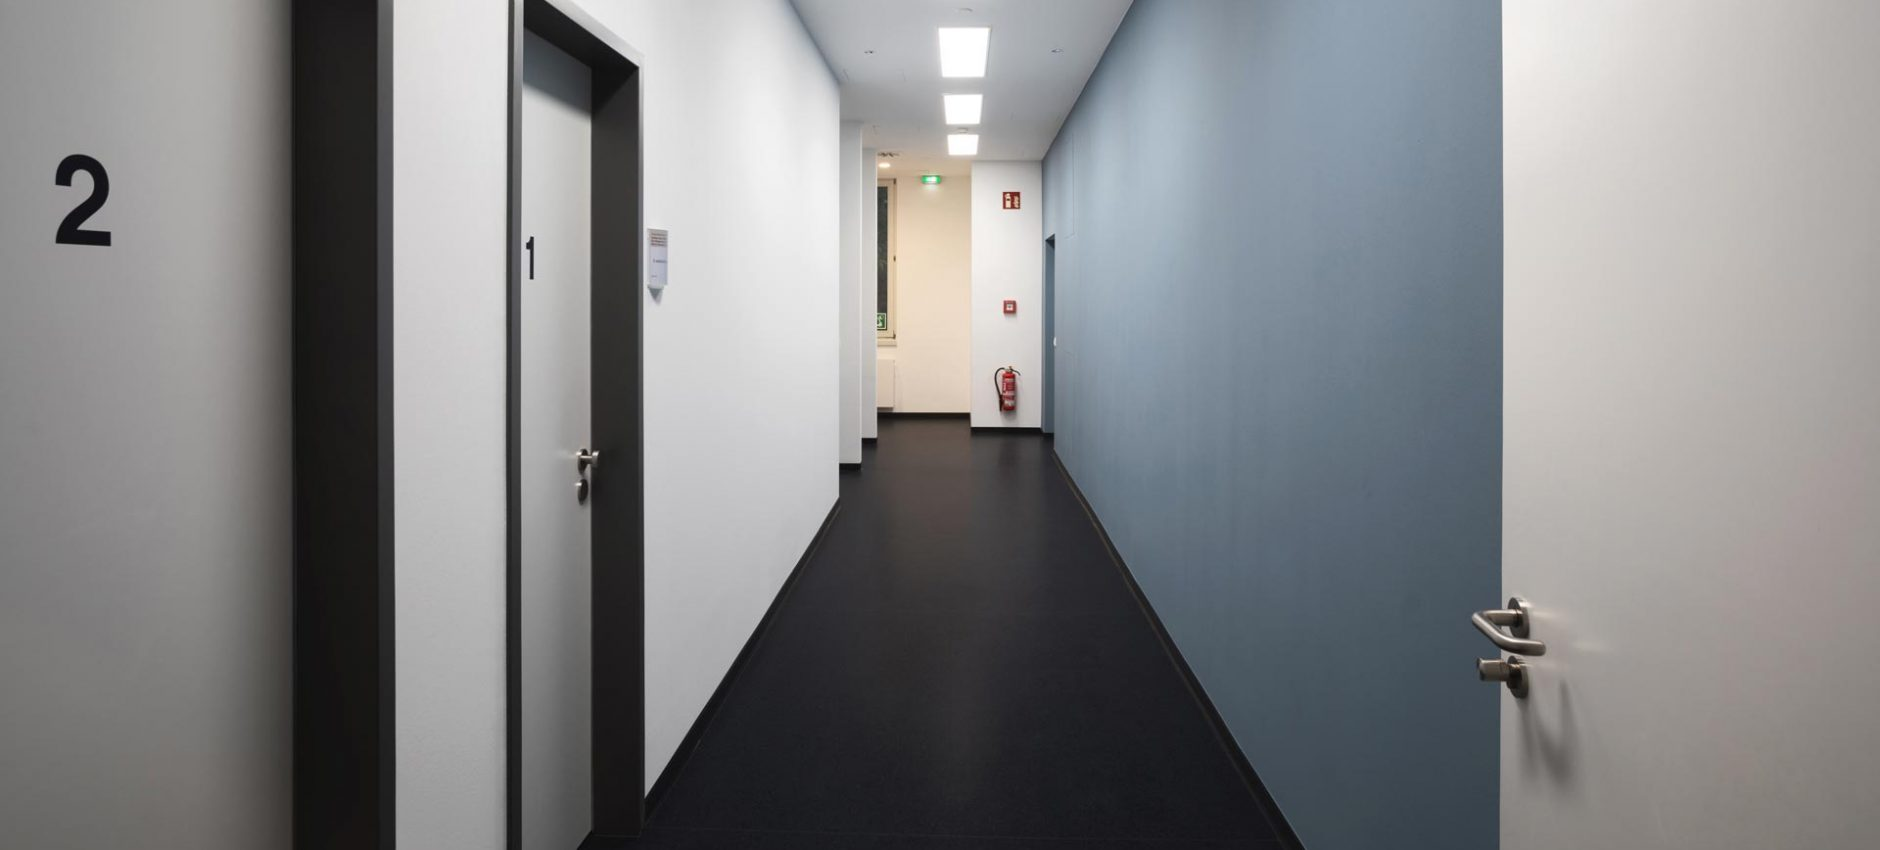 10_Haus4_Uniklinikum_Dresden_Warteraeume.jpg